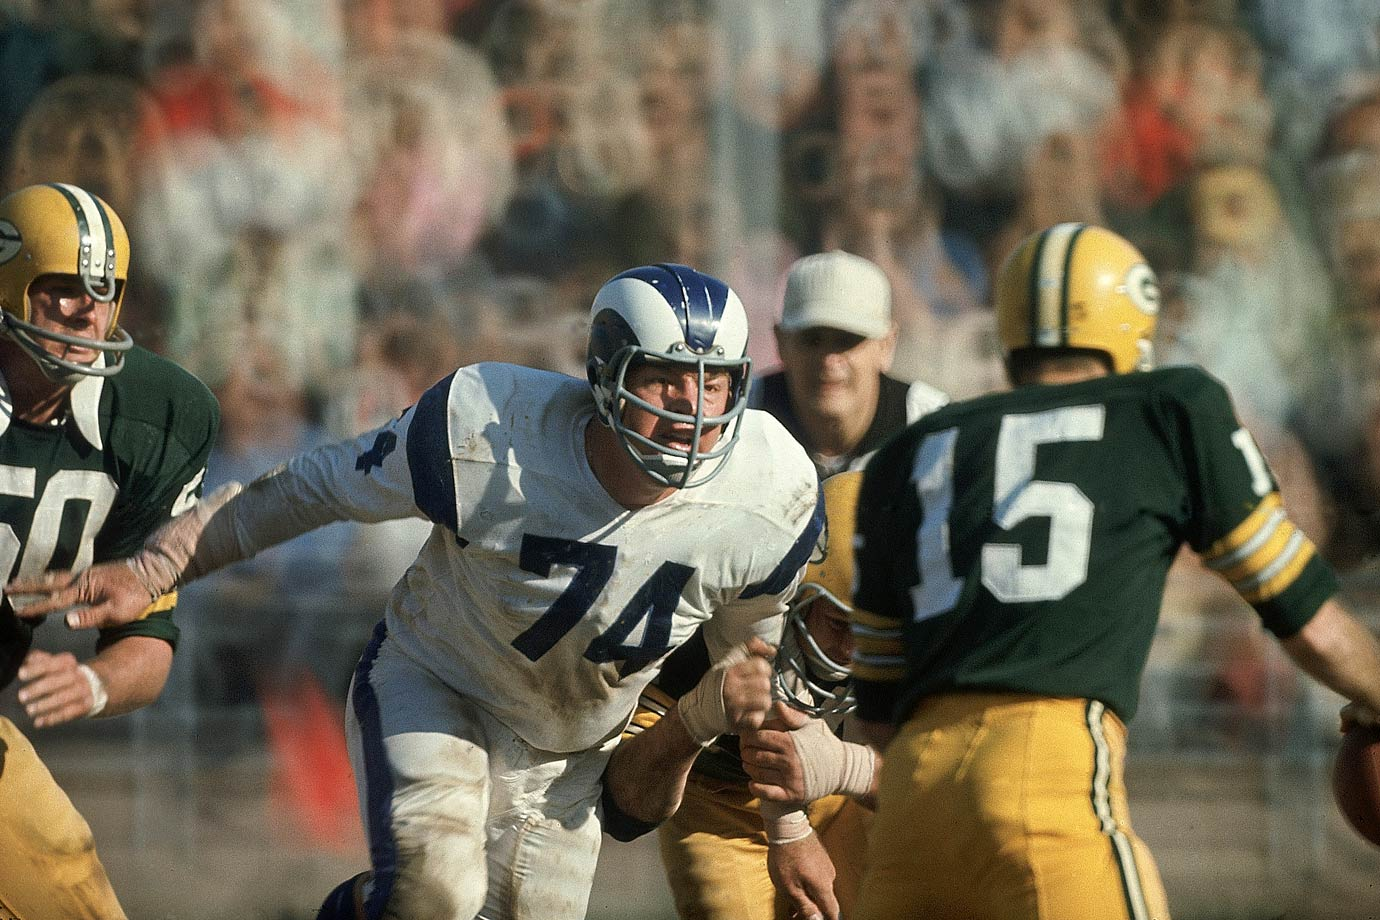 Dec. 9, 1967 — Los Angeles Rams vs. Green Bay Packers